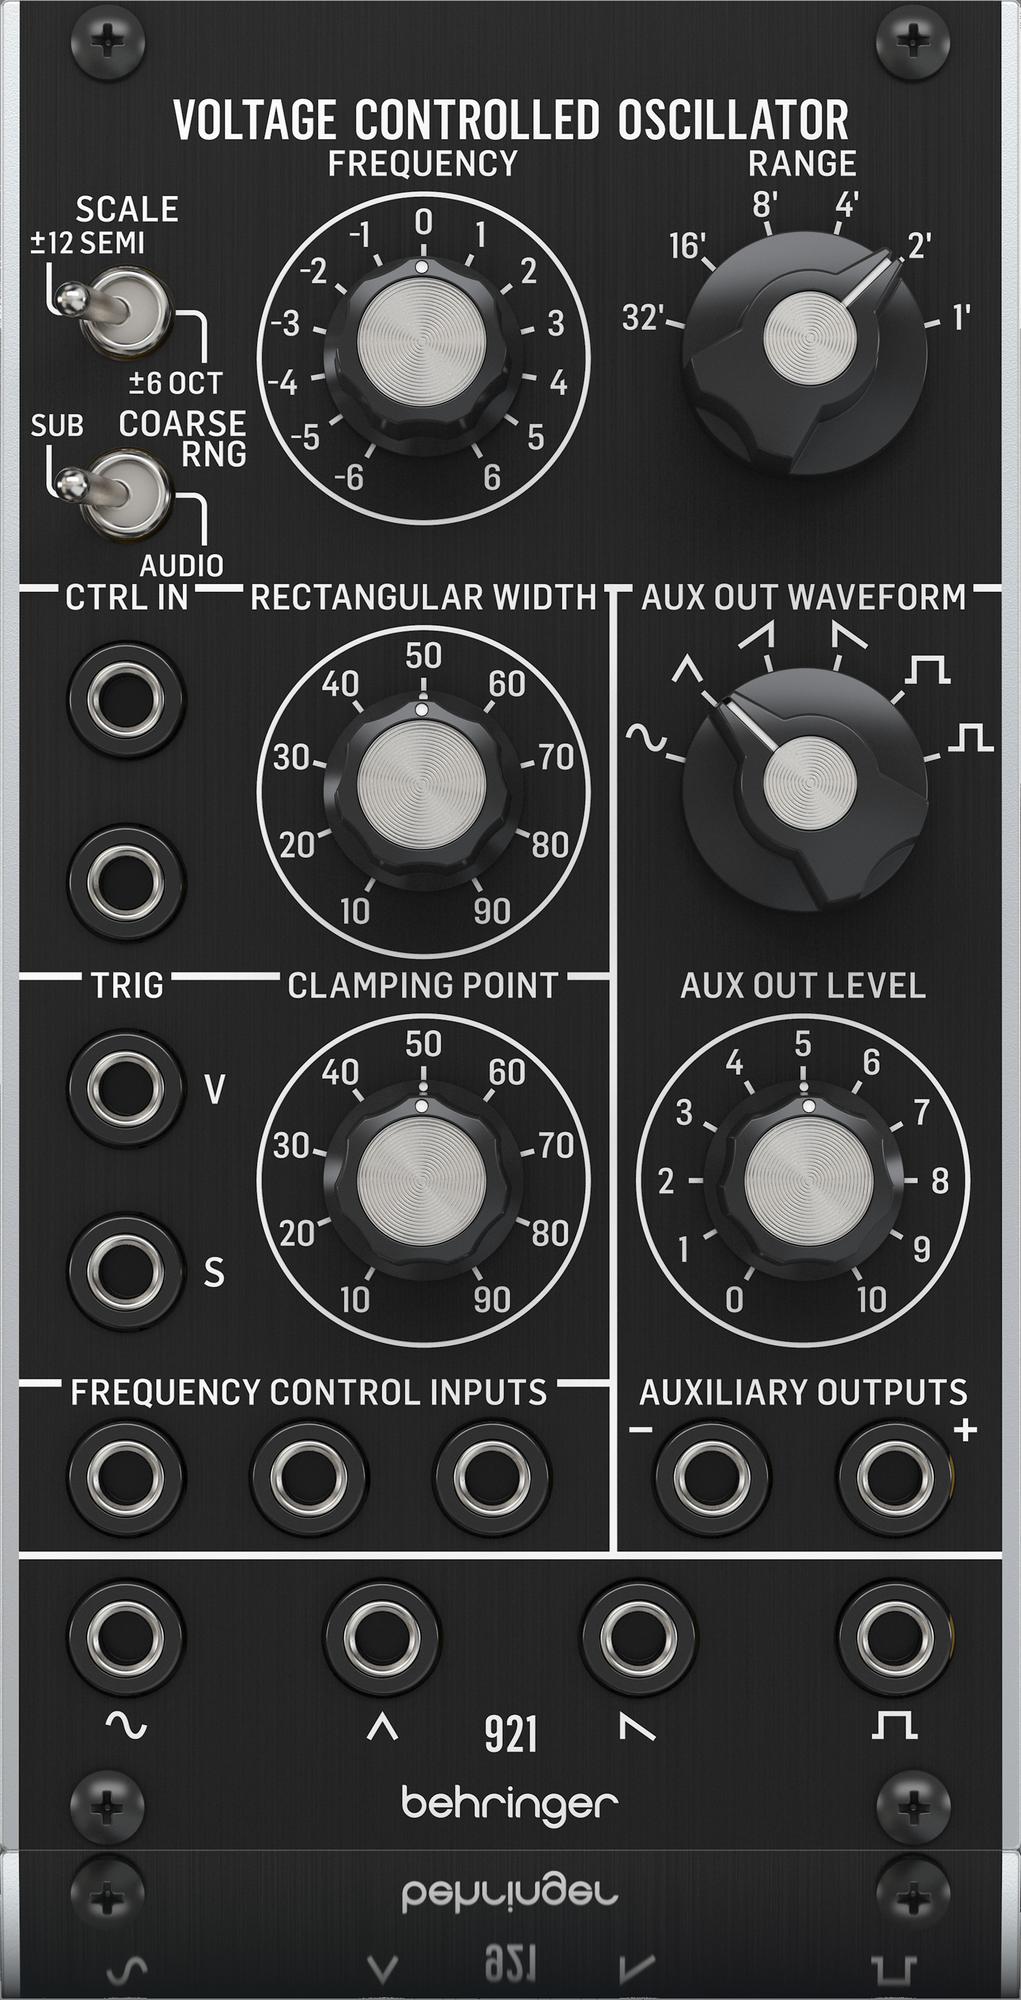 Behringer - X2C - CREA 921 VOLTAGE CONTROLLED OSCILLATOR